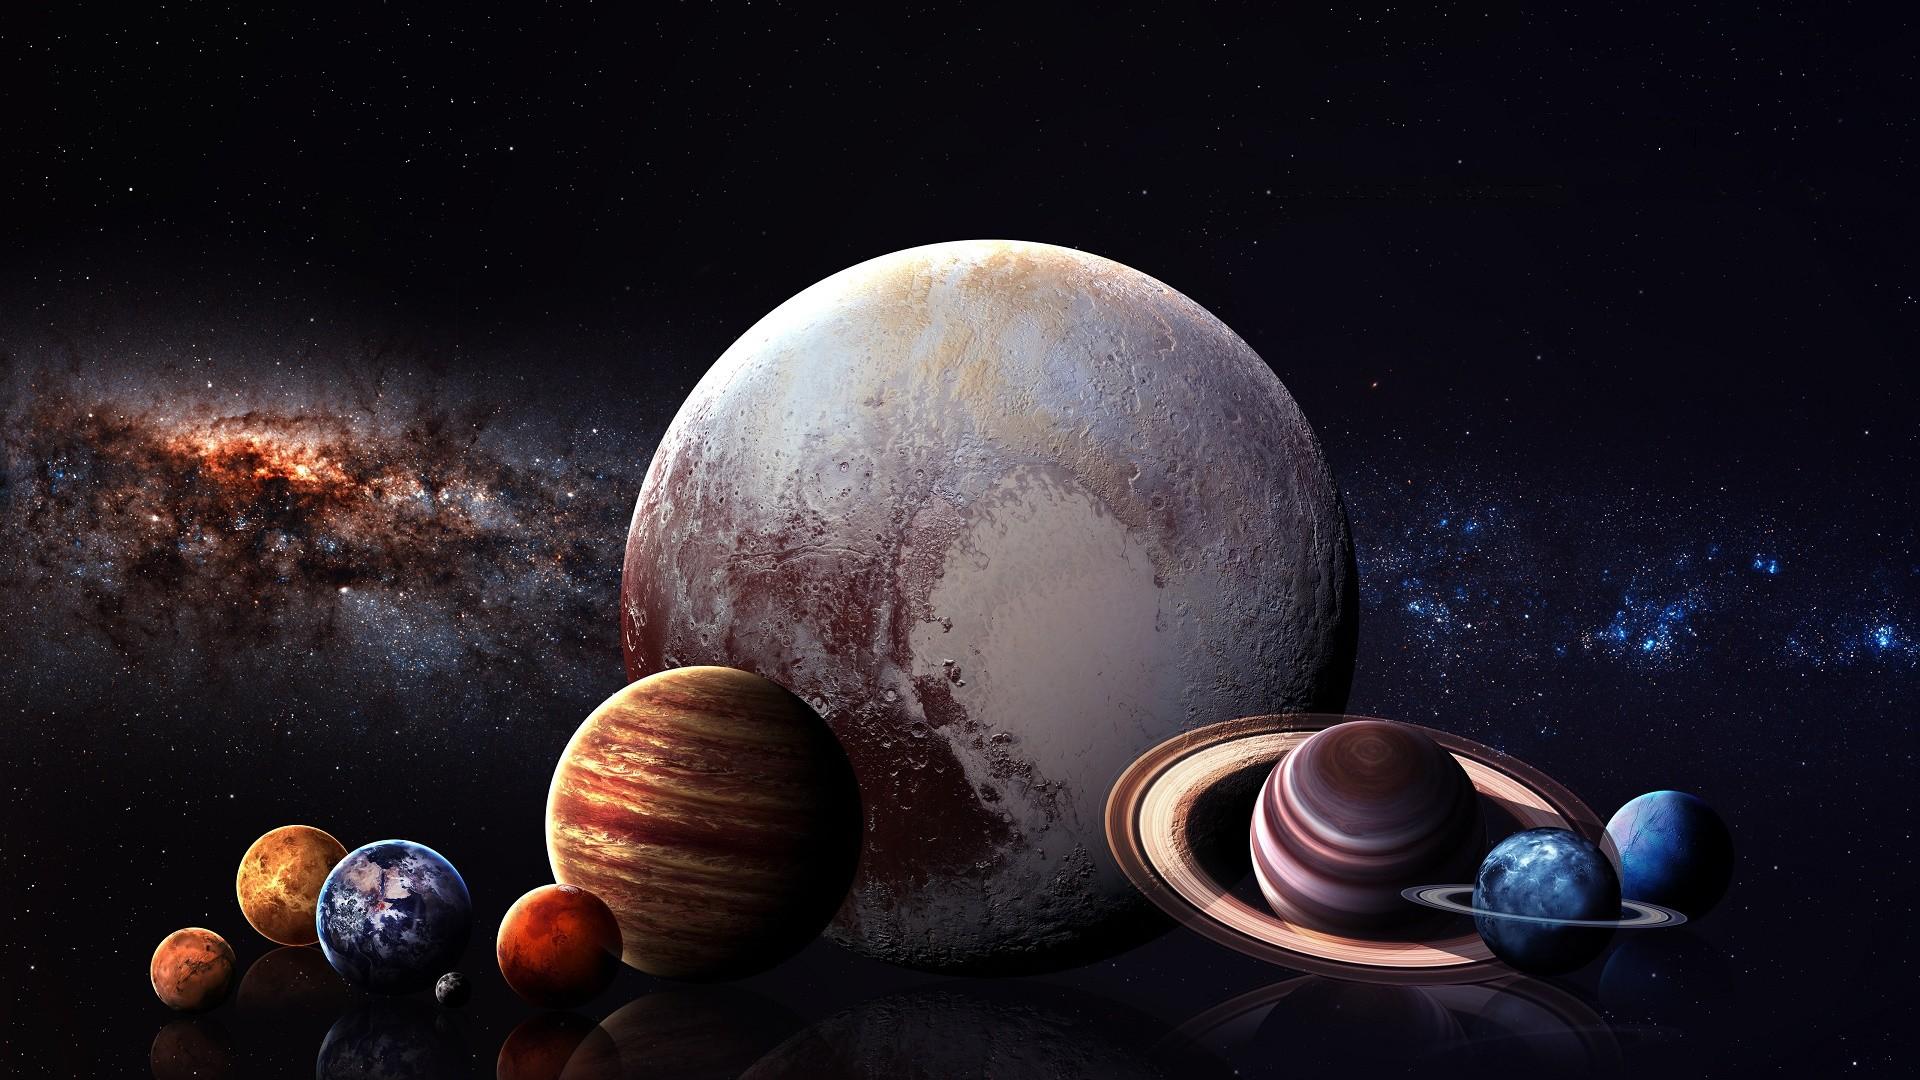 Wallpaper Illustration Digital Art Planet Reflection Stars Earth Space Moon Milky Way Atmosphere Mars Jupiter Universe Saturn Astronomy